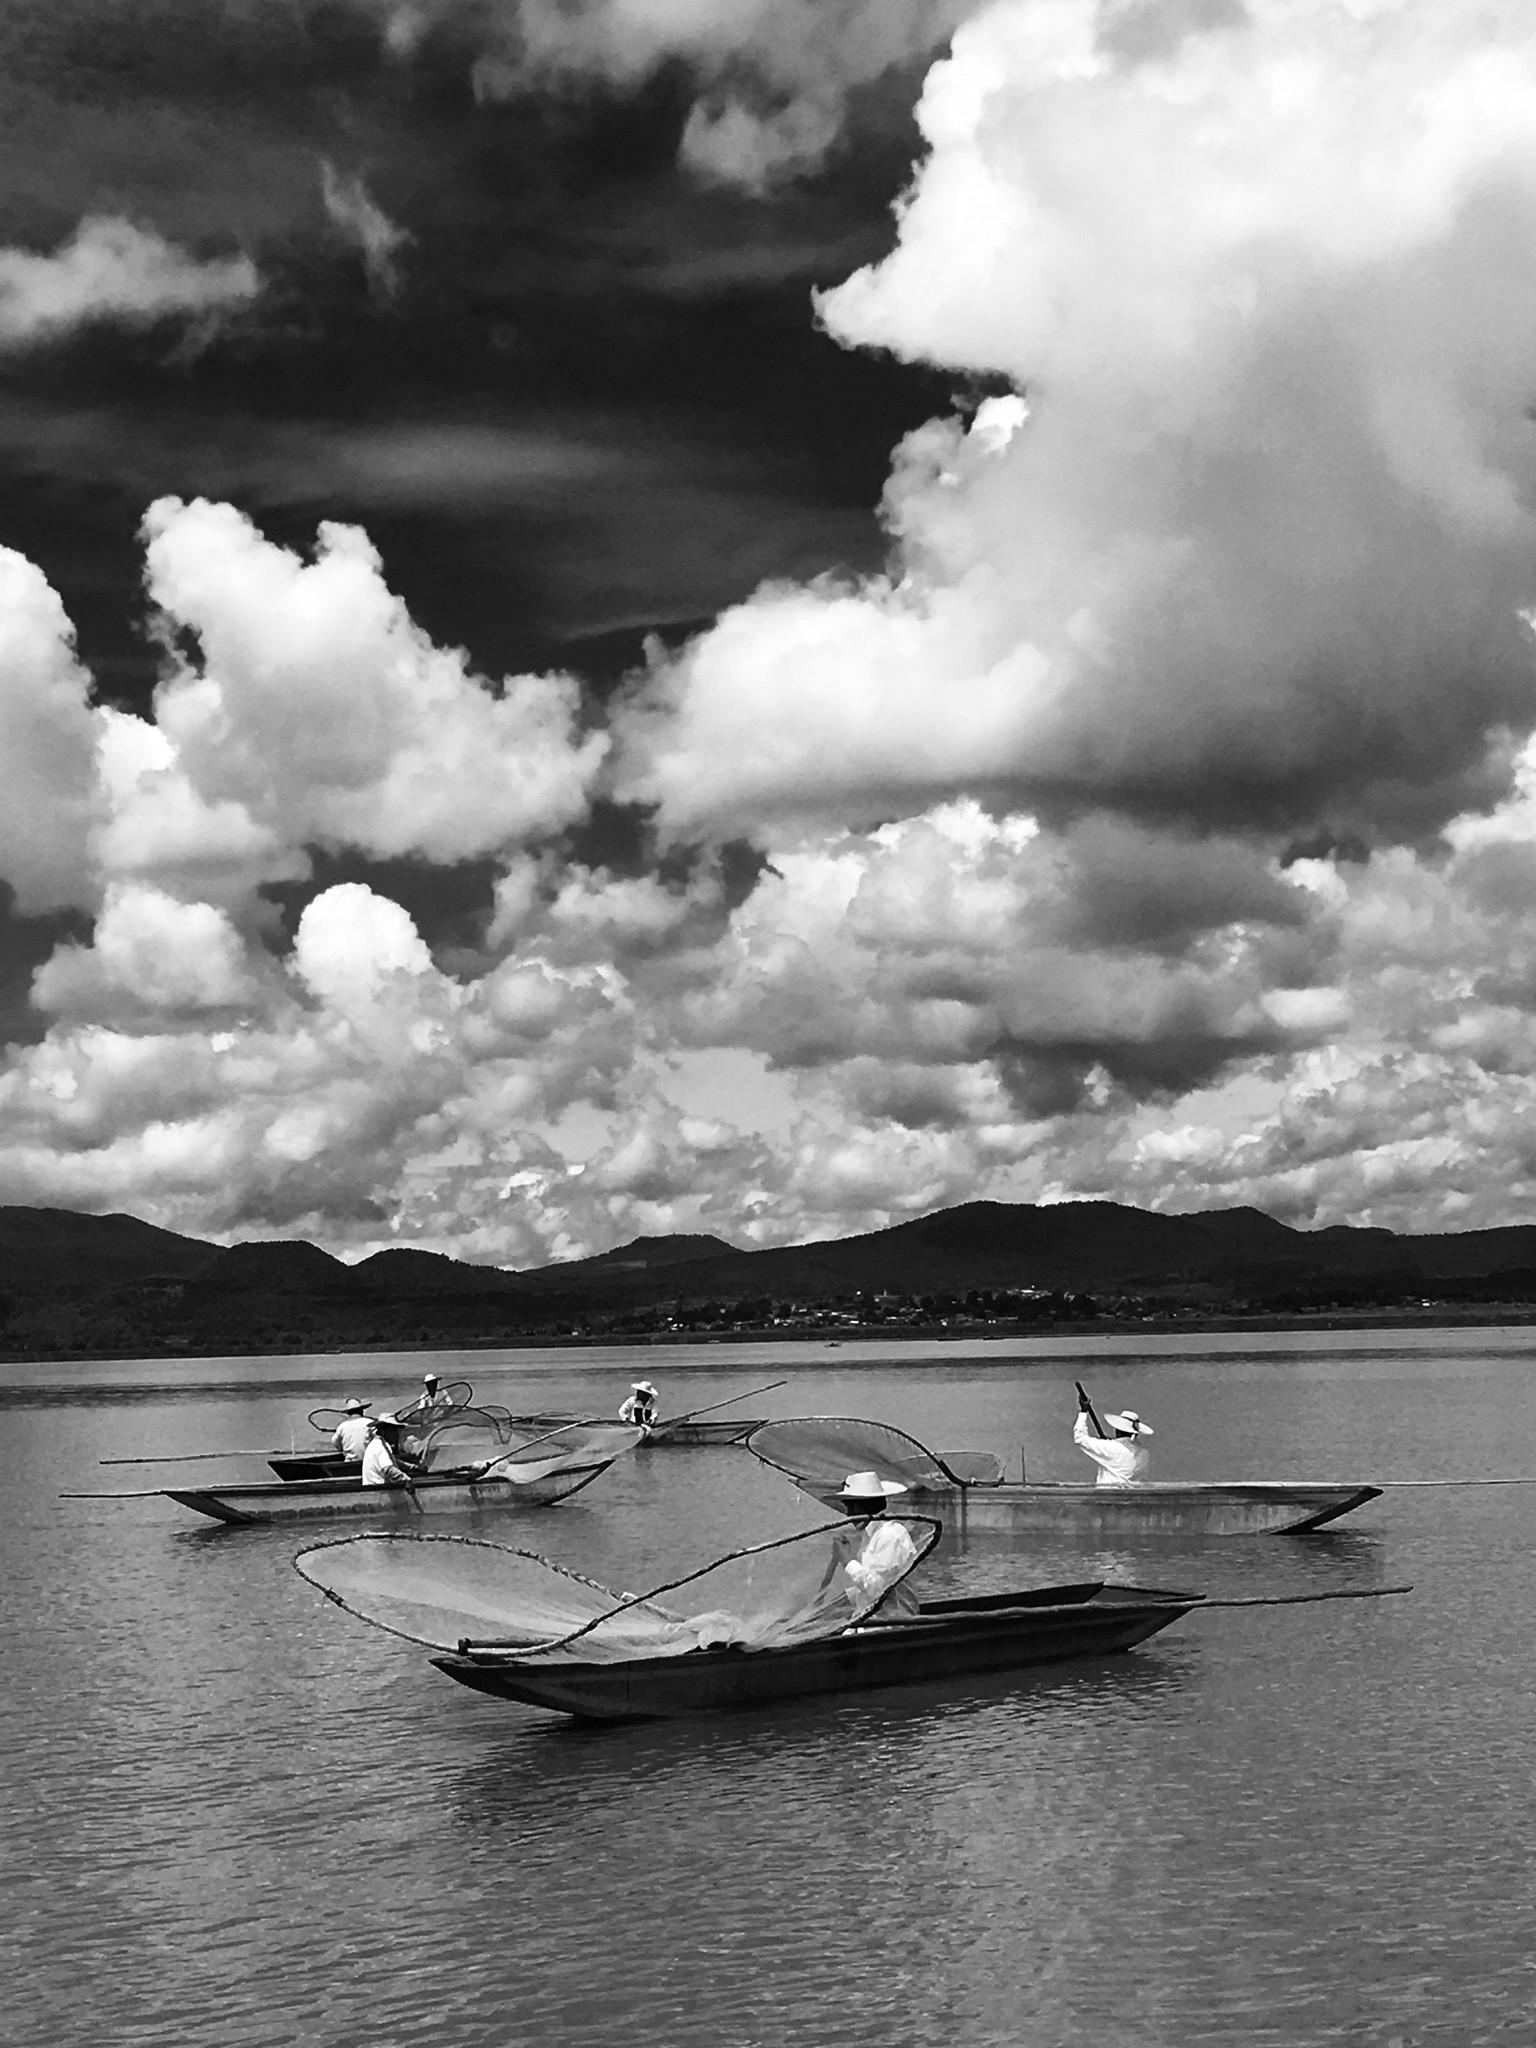 Lake Patzcuaro, Michoacan Mexico